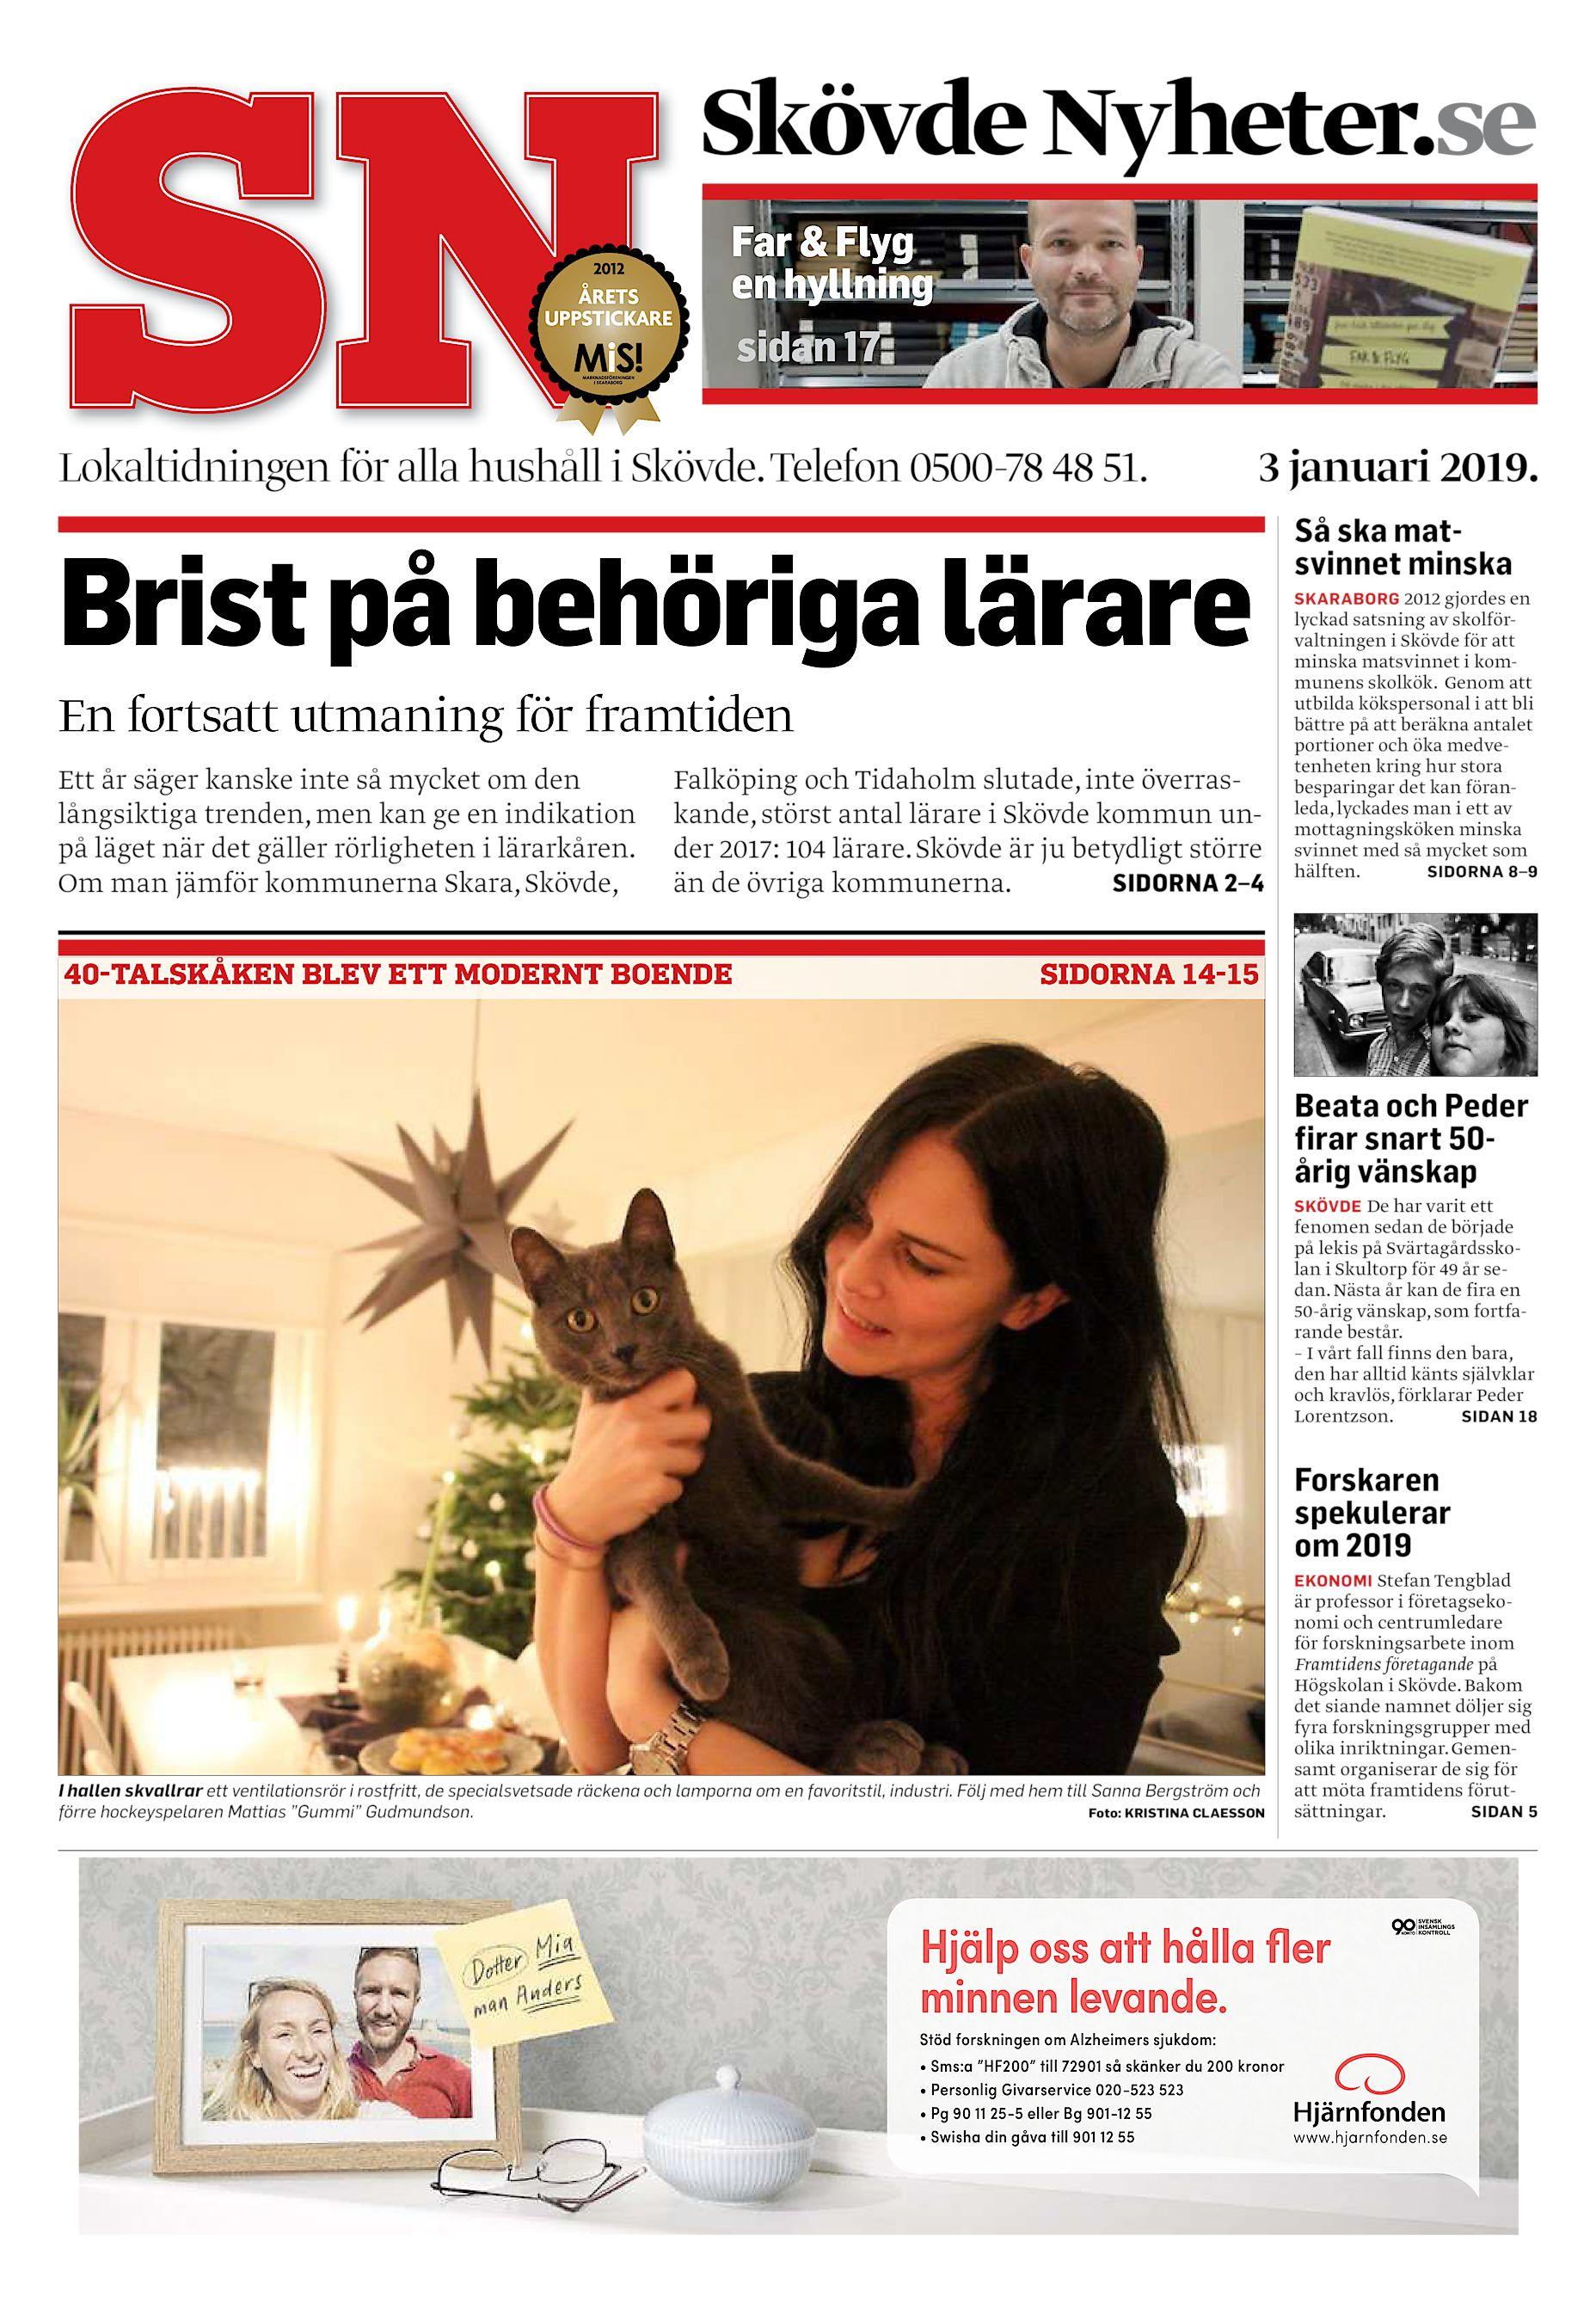 Skövde Nyheter SN-20190103 (endast text) 2f3f8bce92de2